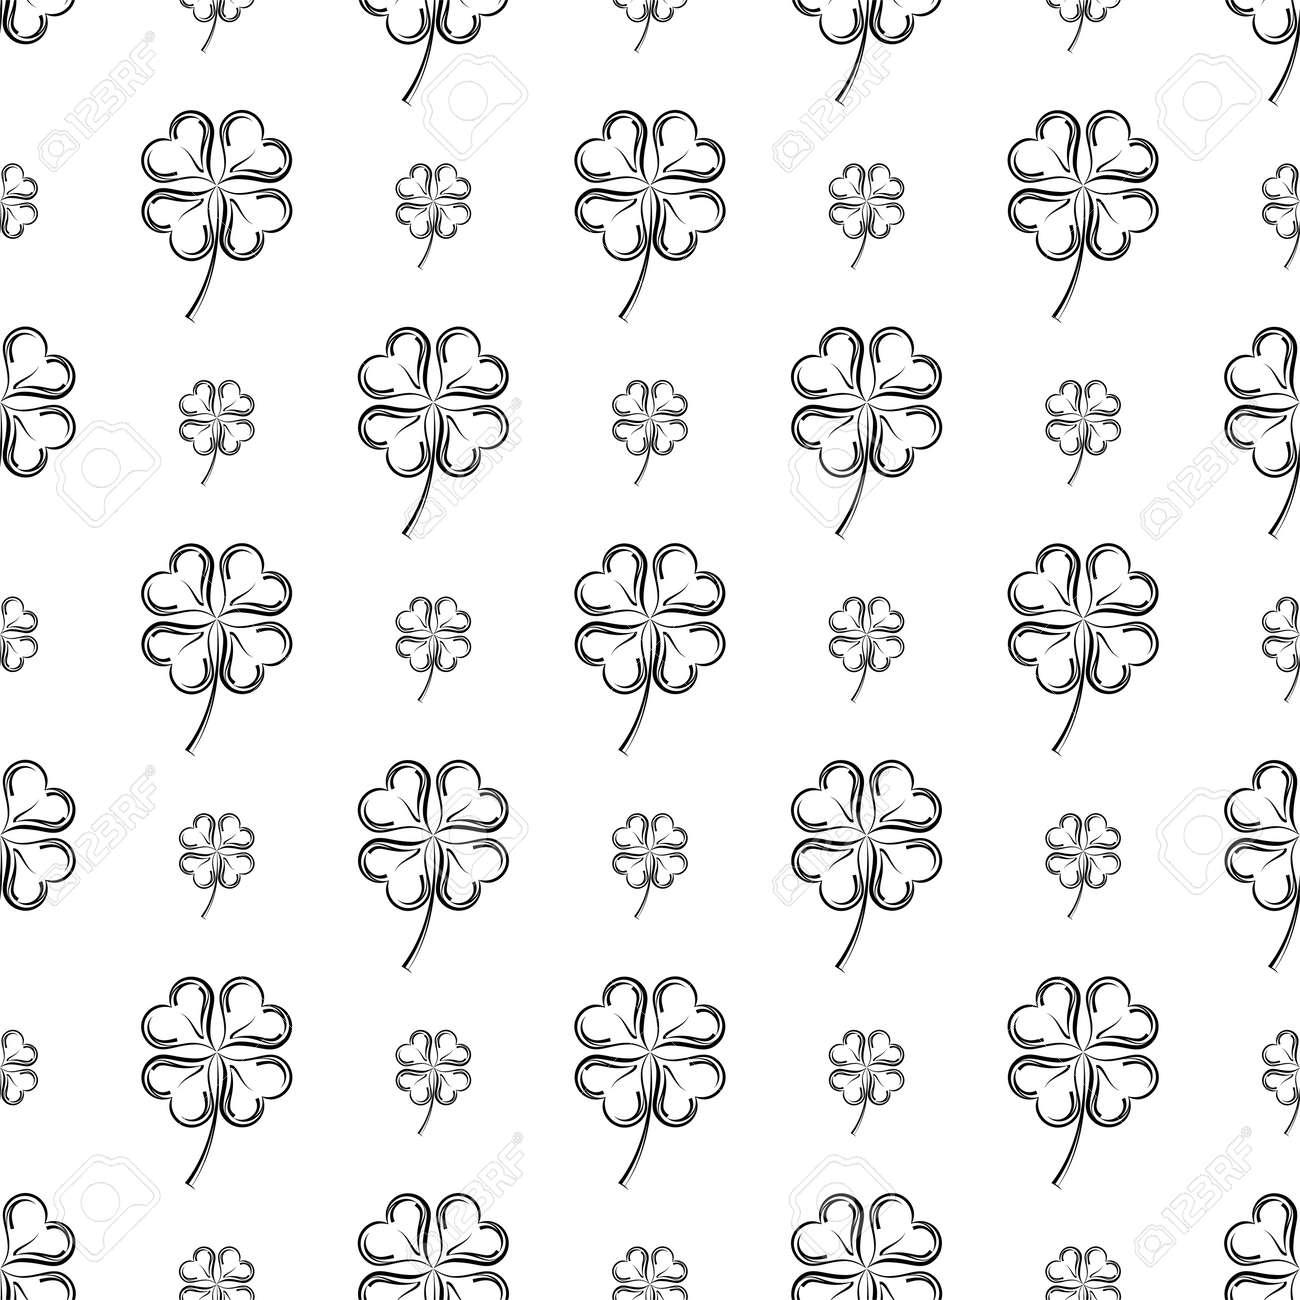 Clover Four Leaf Shamrock Seamless Pattern Vector Art Illustration - 148090750